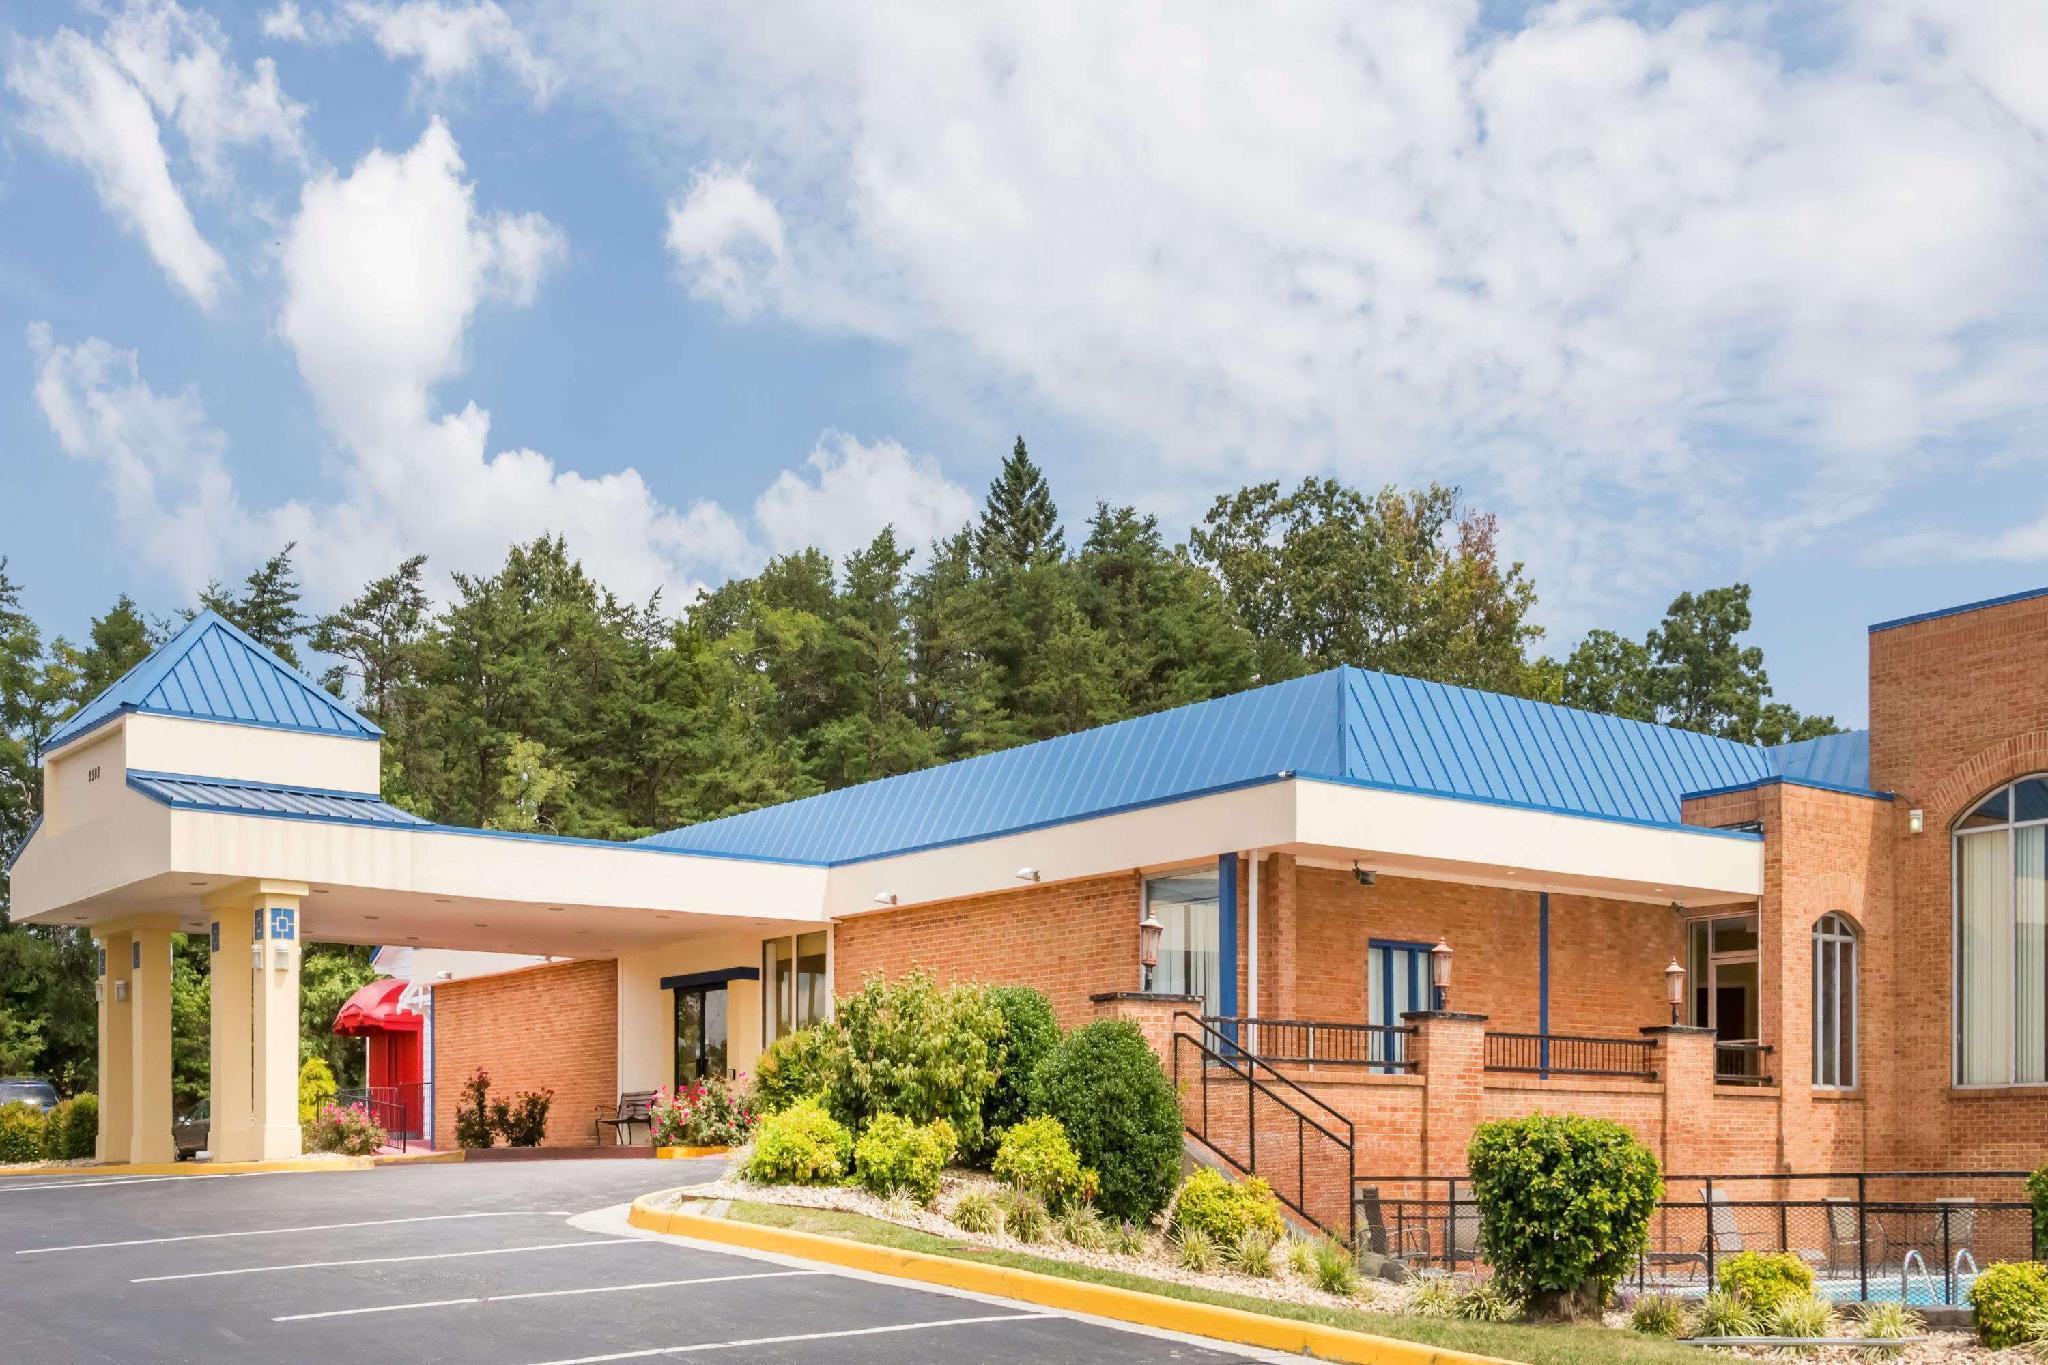 Days Inn By Wyndham Blacksburg Conference Center